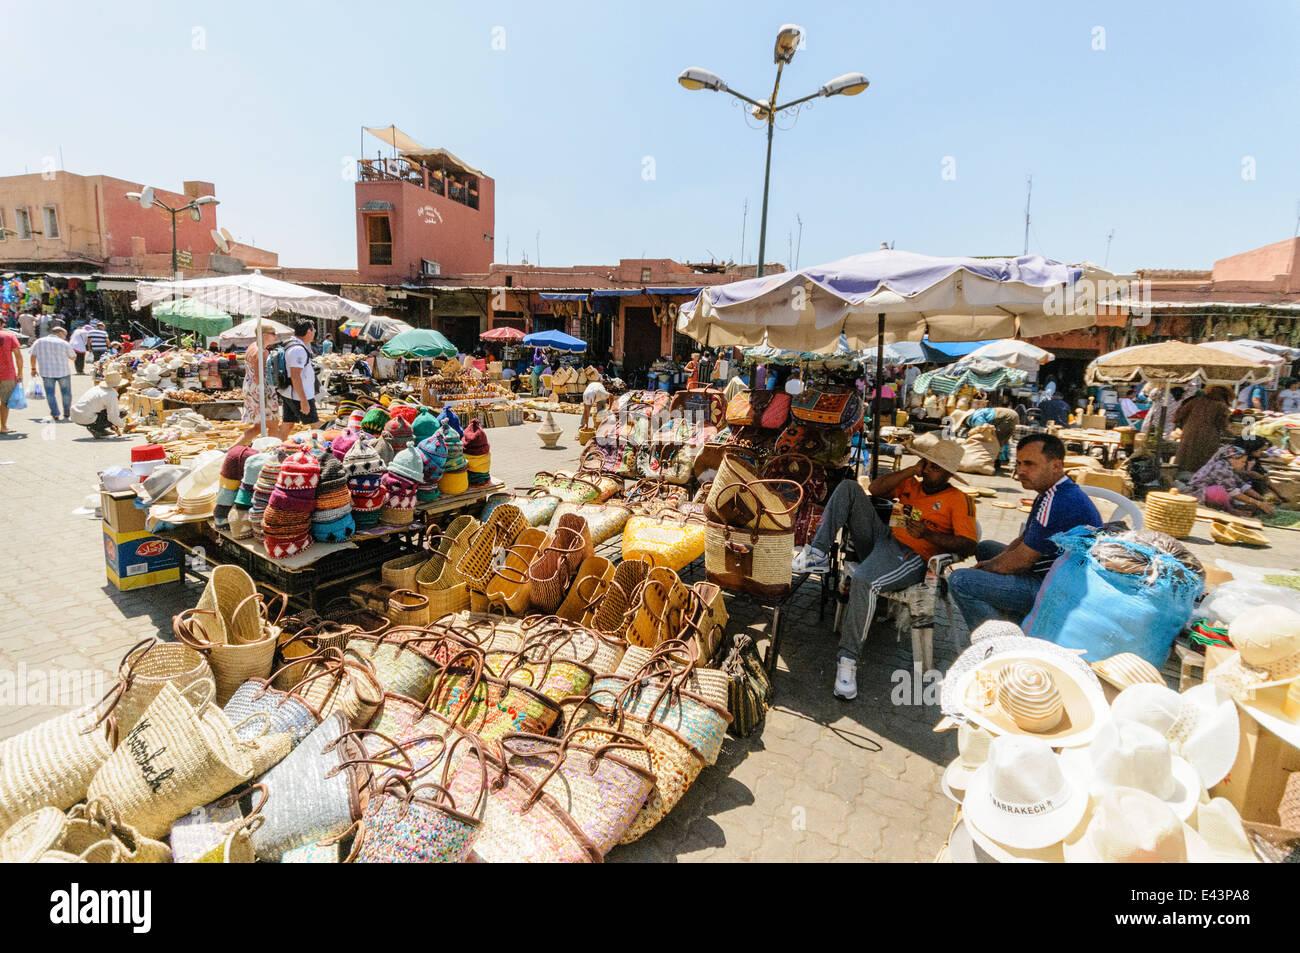 hats marrakech souk stockfotos hats marrakech souk bilder seite 2 alamy. Black Bedroom Furniture Sets. Home Design Ideas